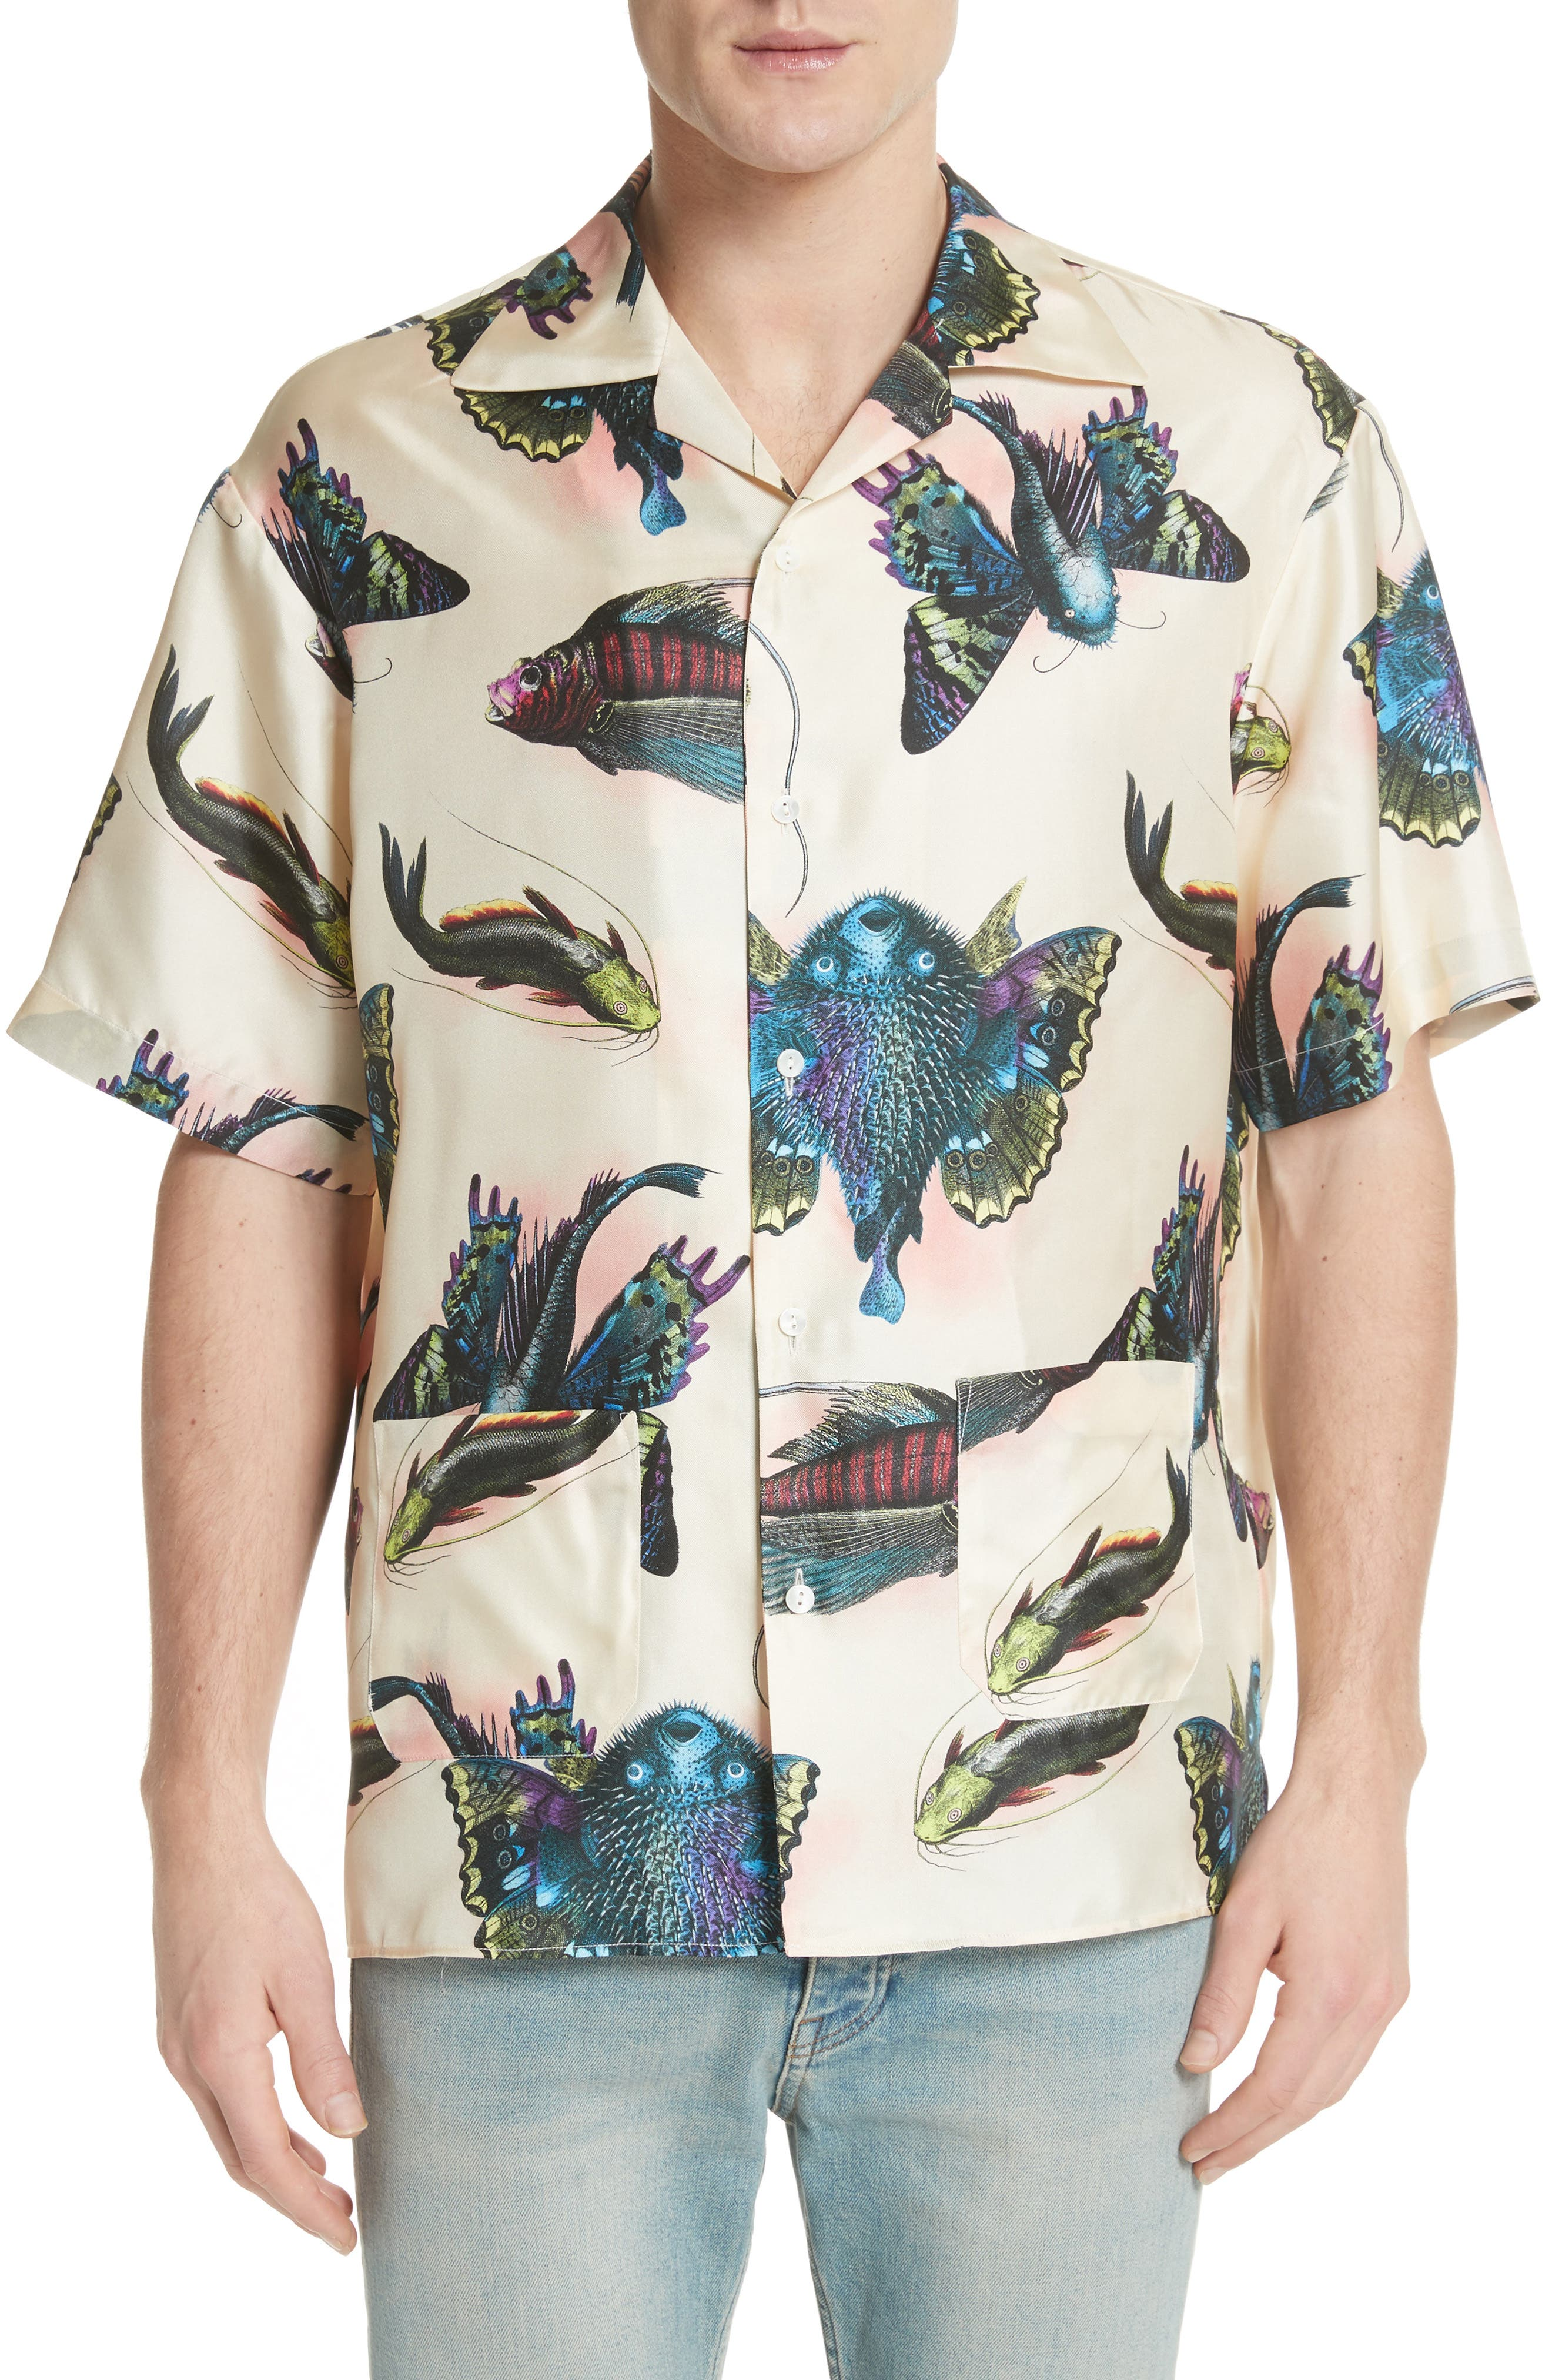 bf3d10836ef Gucci Fish-Print Short-Sleeved Silk-Satin Twill Shirt In 9273 Ivory ...